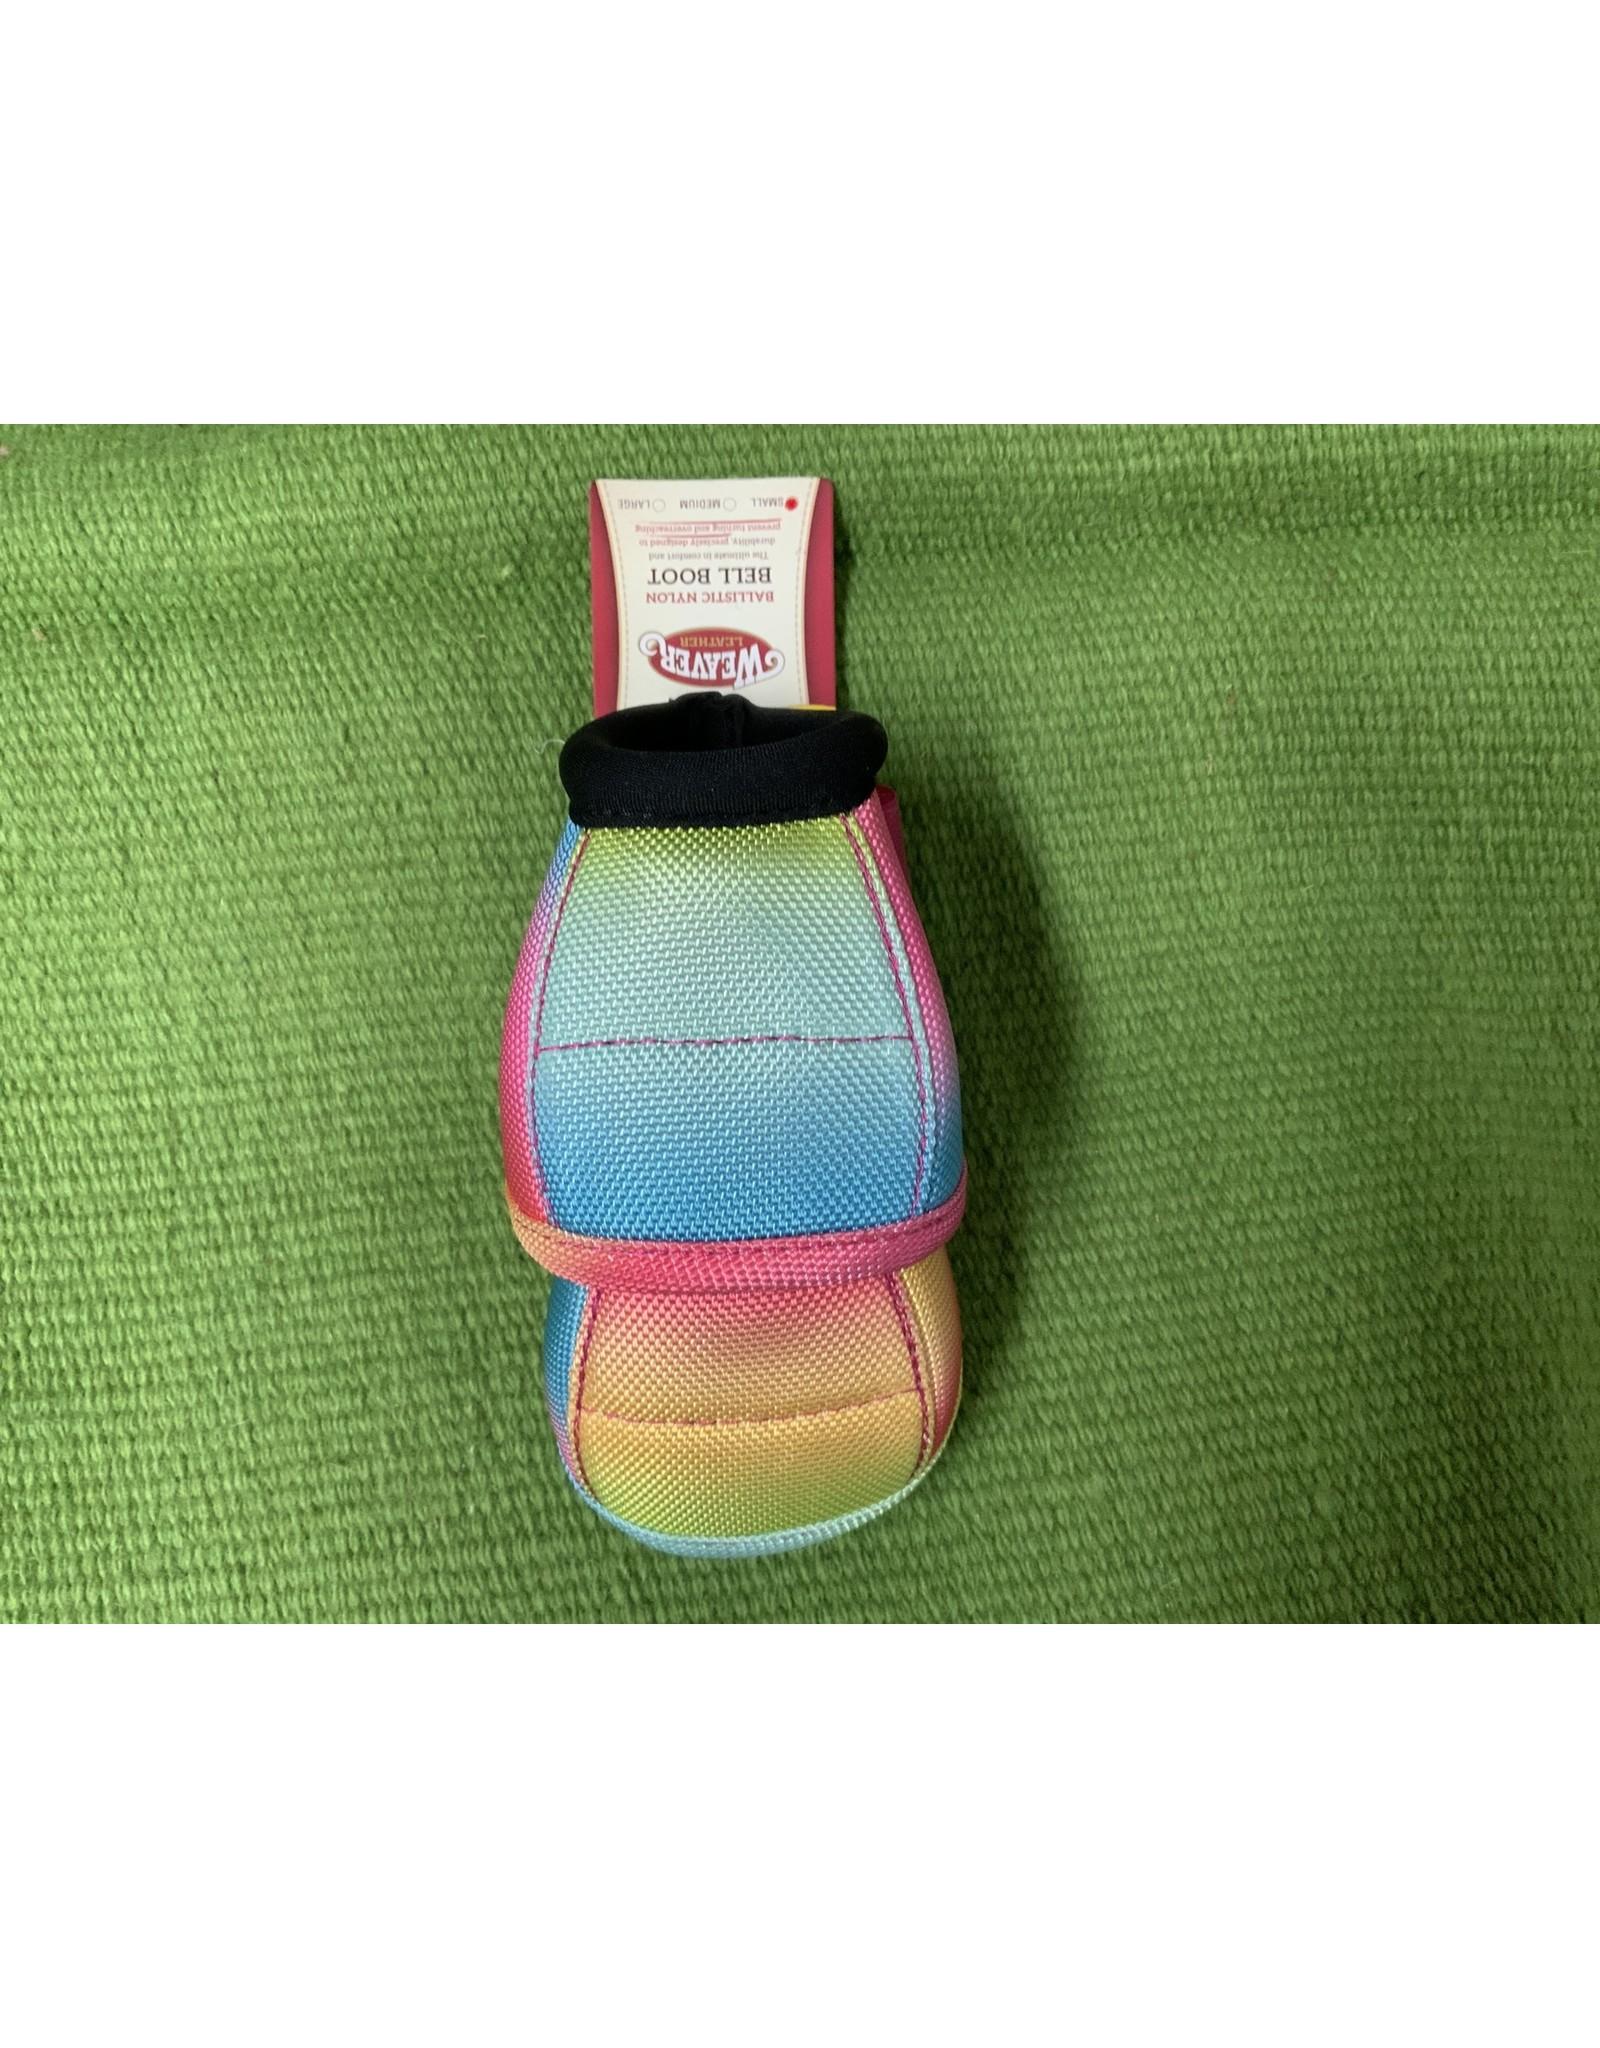 Bell Boot- Ballistic Nylon Bell Boots - Small - Rainbow - 35-4275-69 ***B/O***